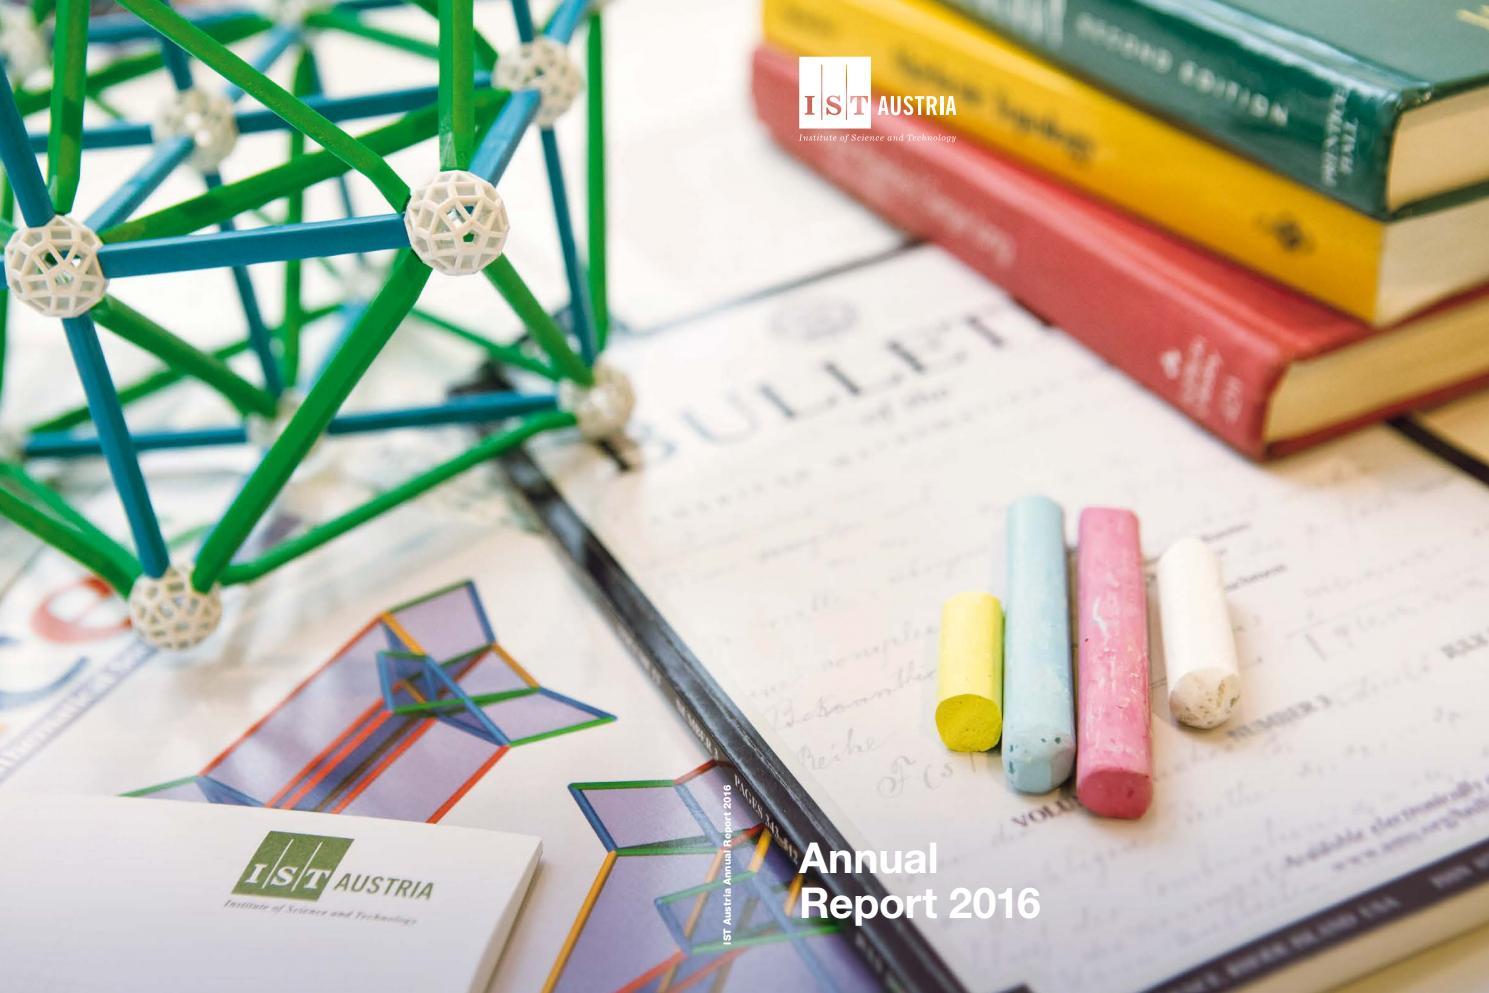 IST Austria Annual Report 2016 by IST Austria - issuu